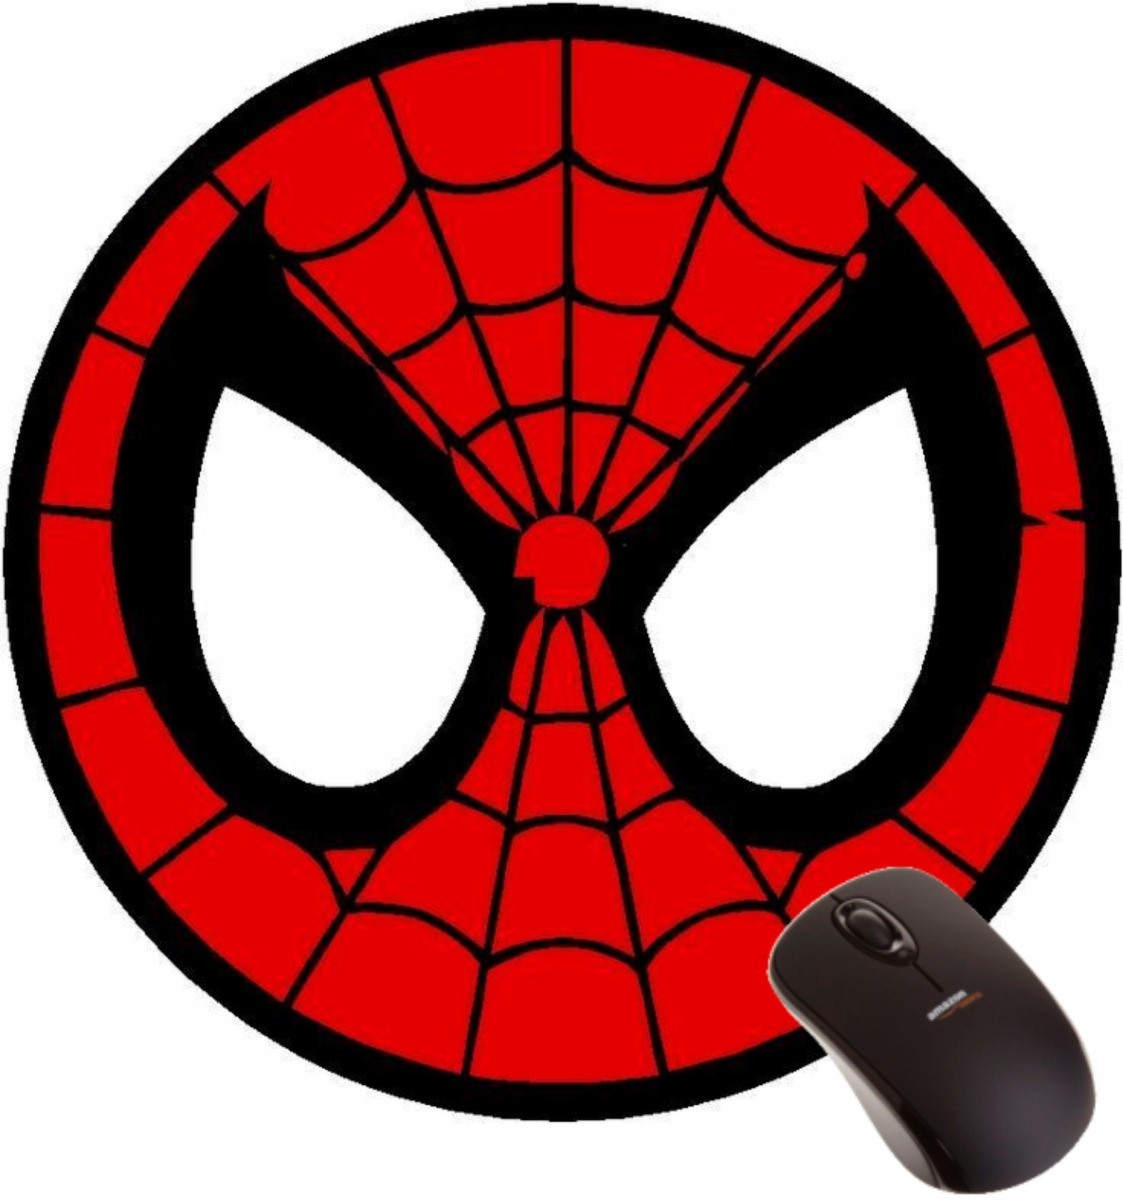 Mousepad Homem Aranha Mascara Super Heroi Marvel Desenho R 22